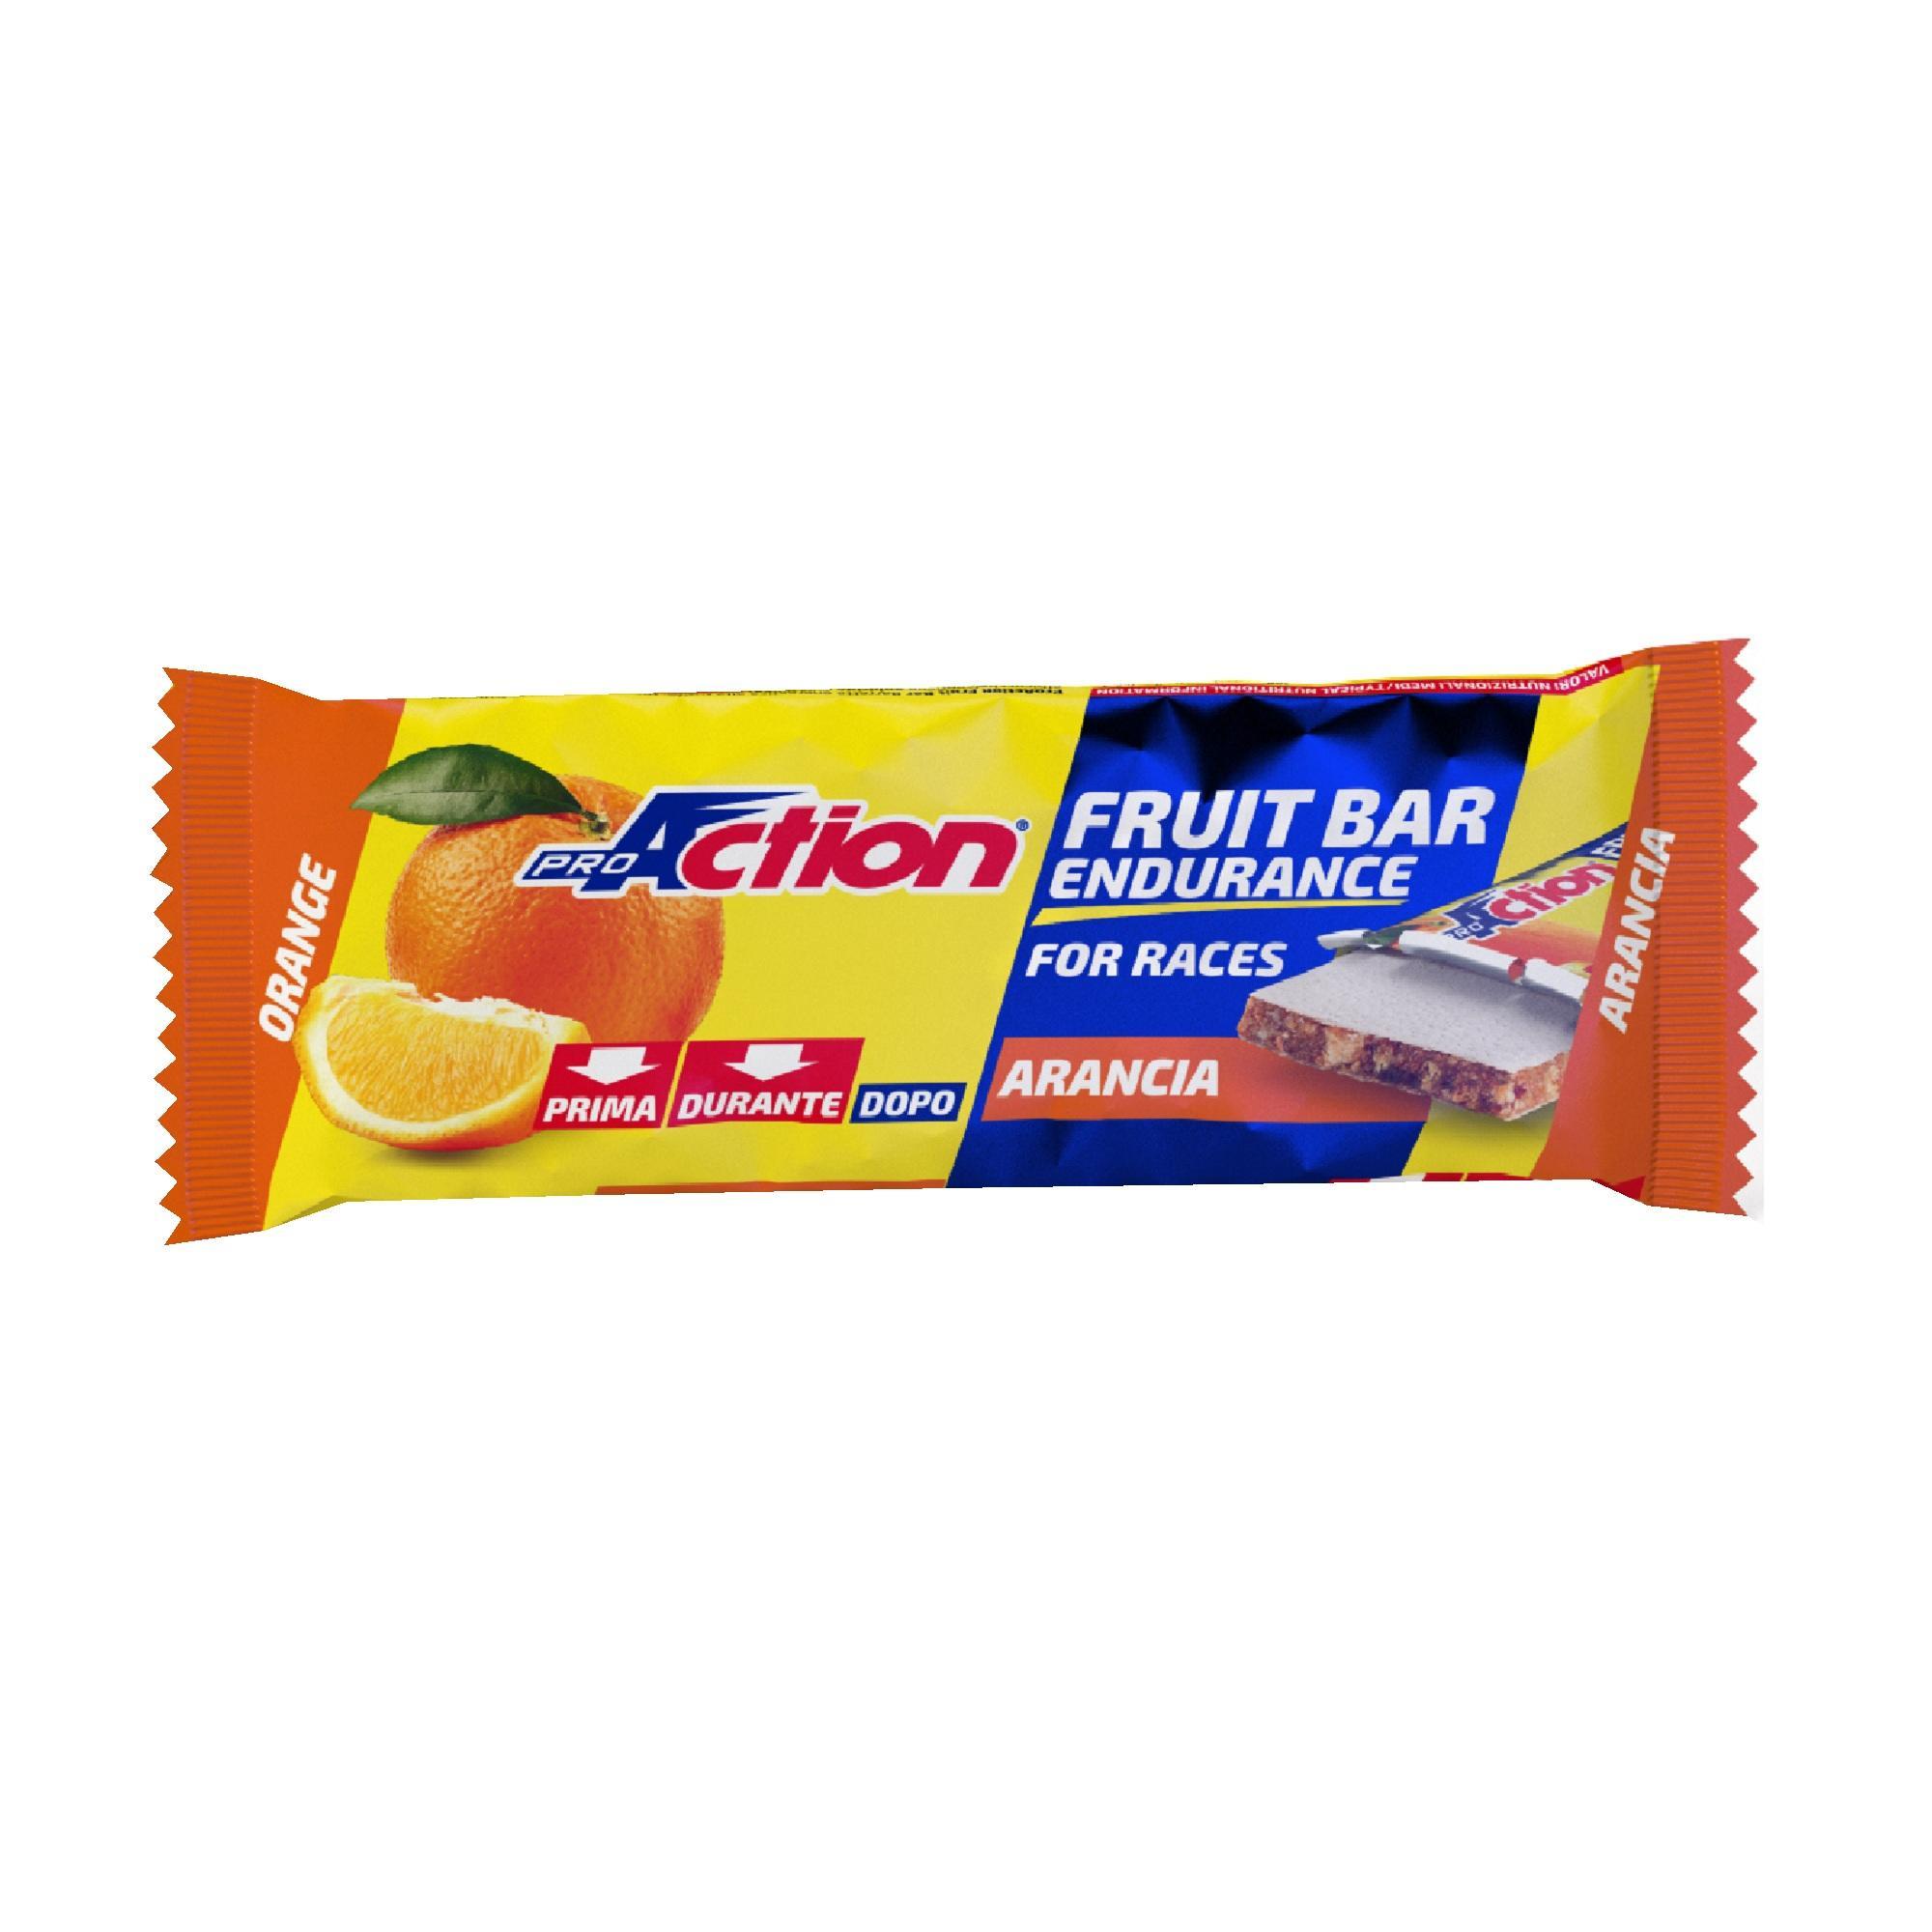 proaction barretta fruit bar endurance for races arancia 40 g